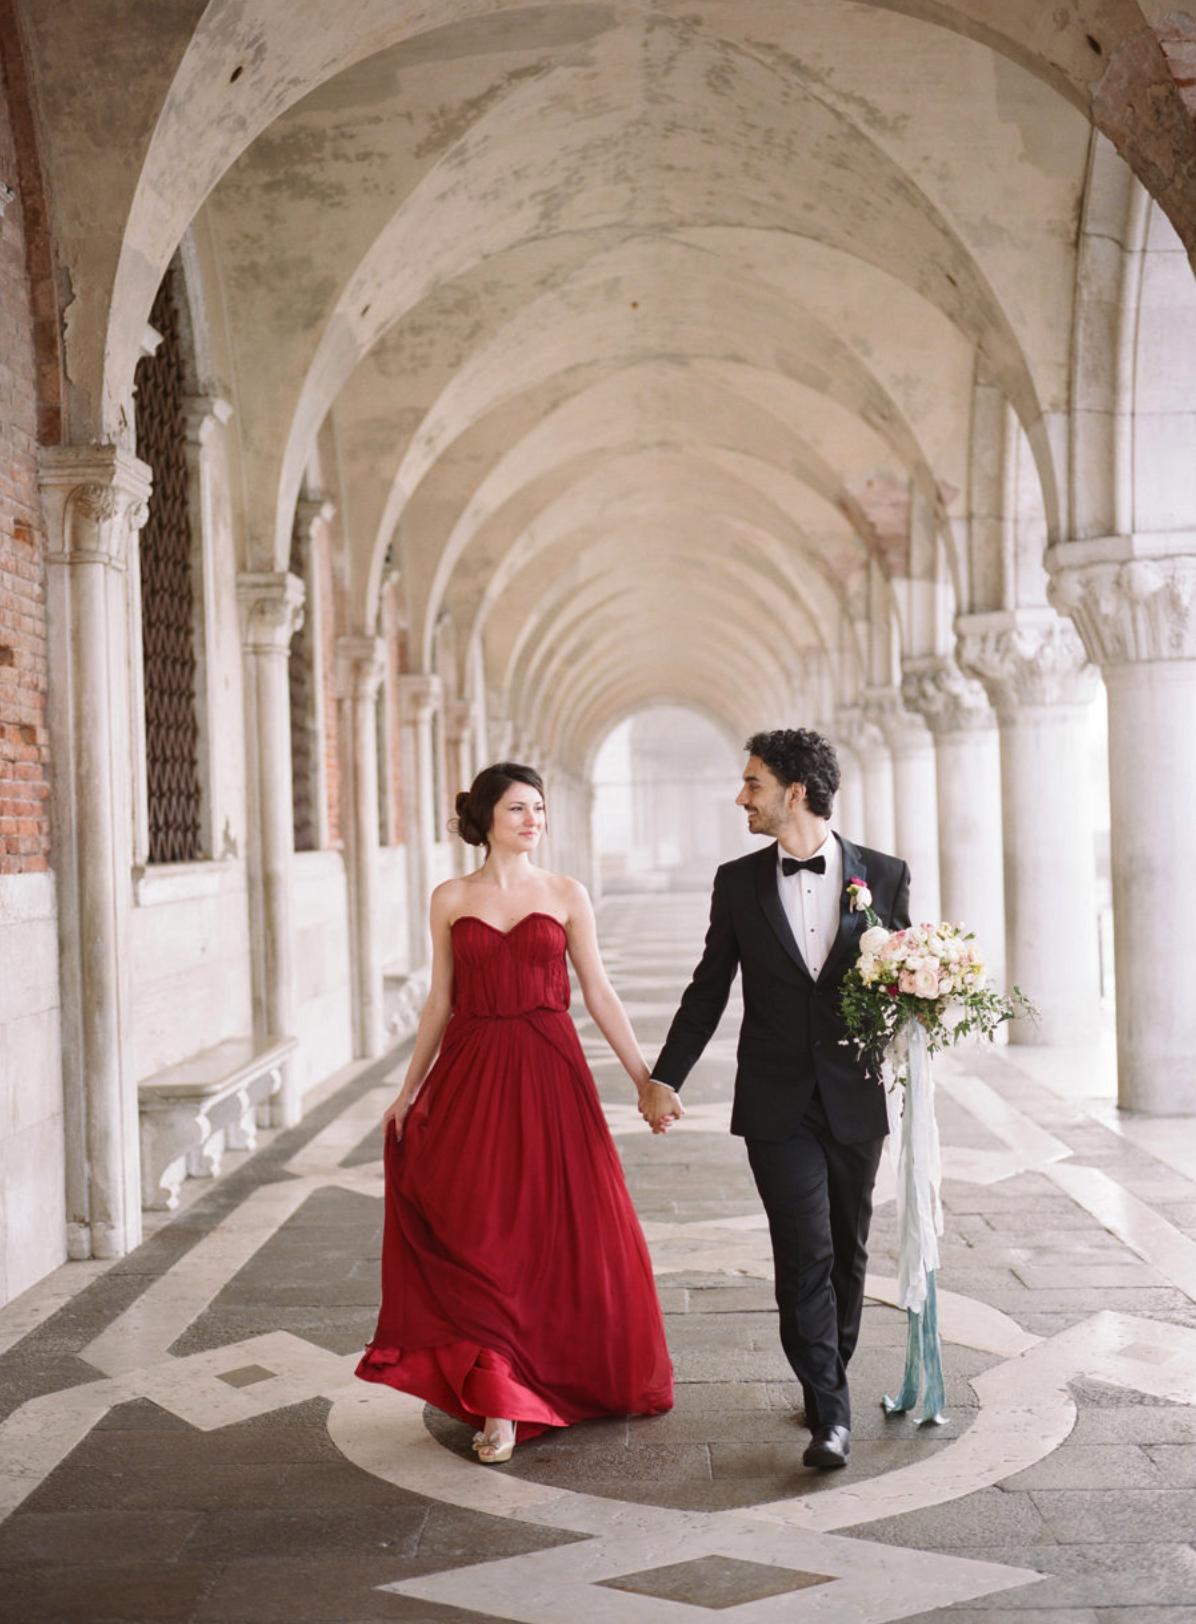 Romantic + Luxe Elopmenet Inspiration in Italy